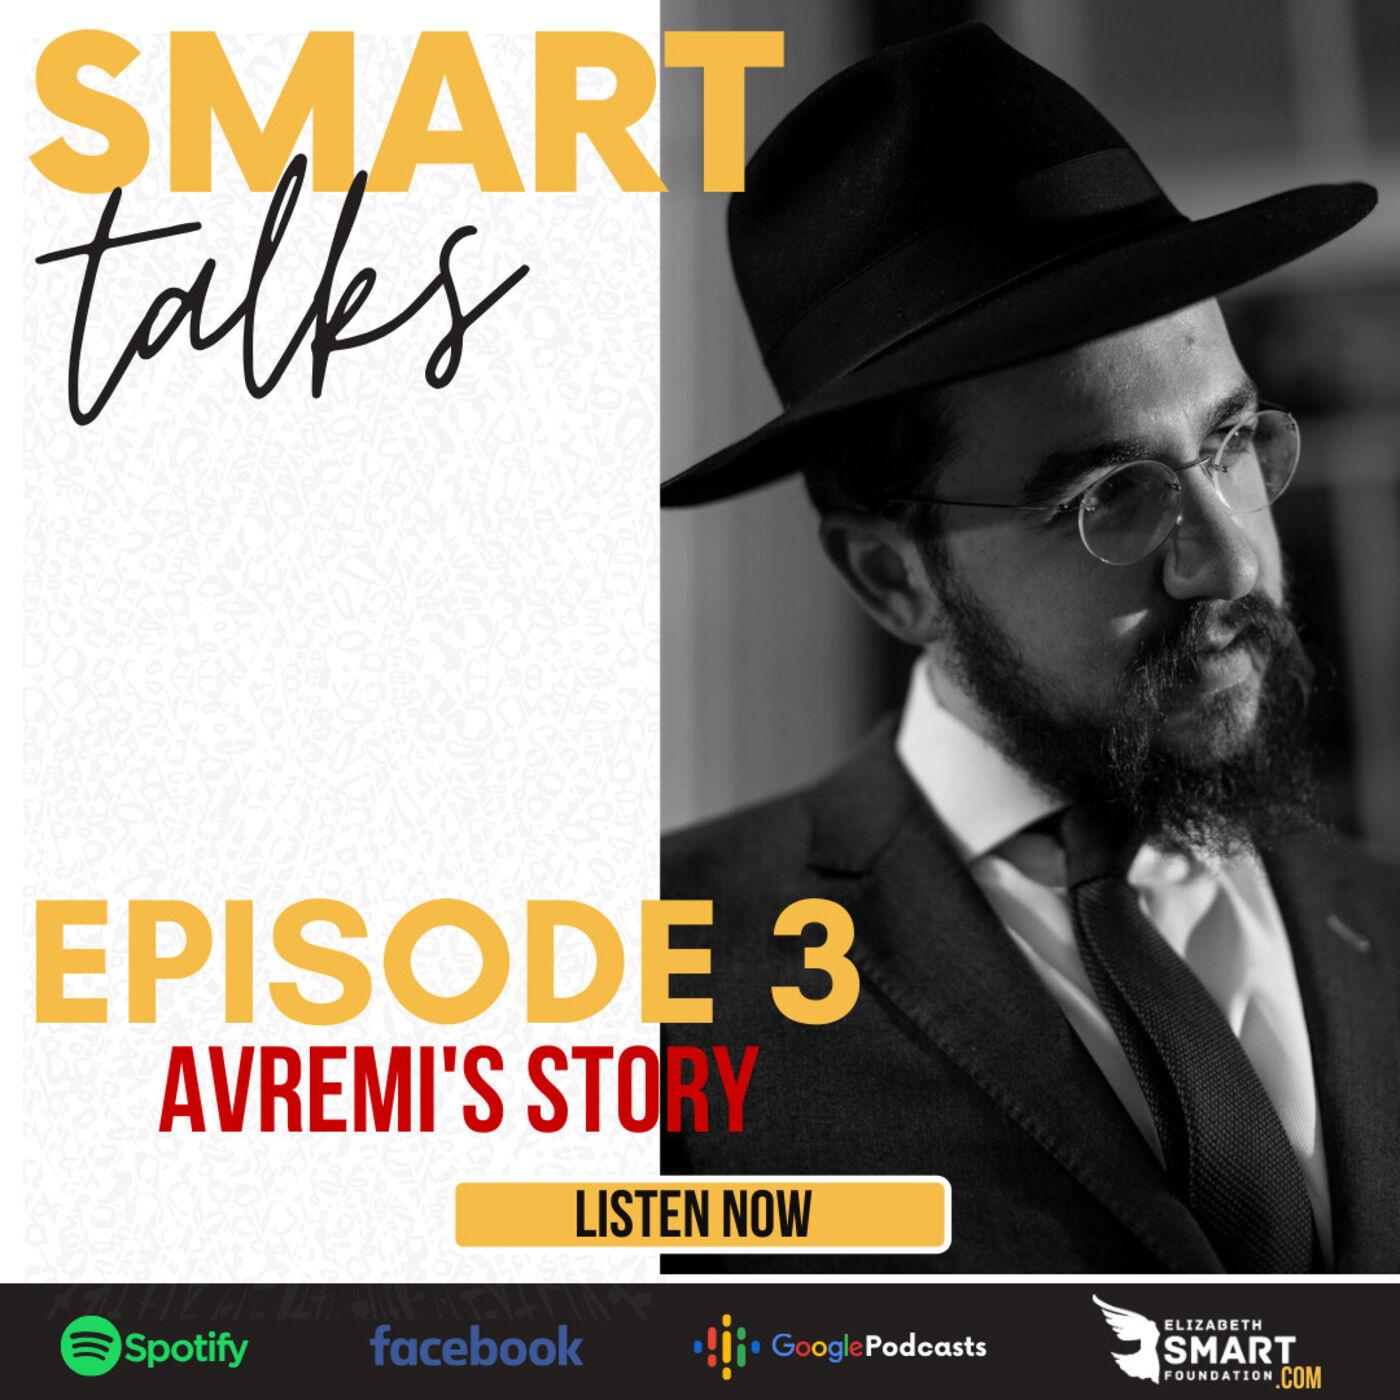 Episode 3: Avremi's Story